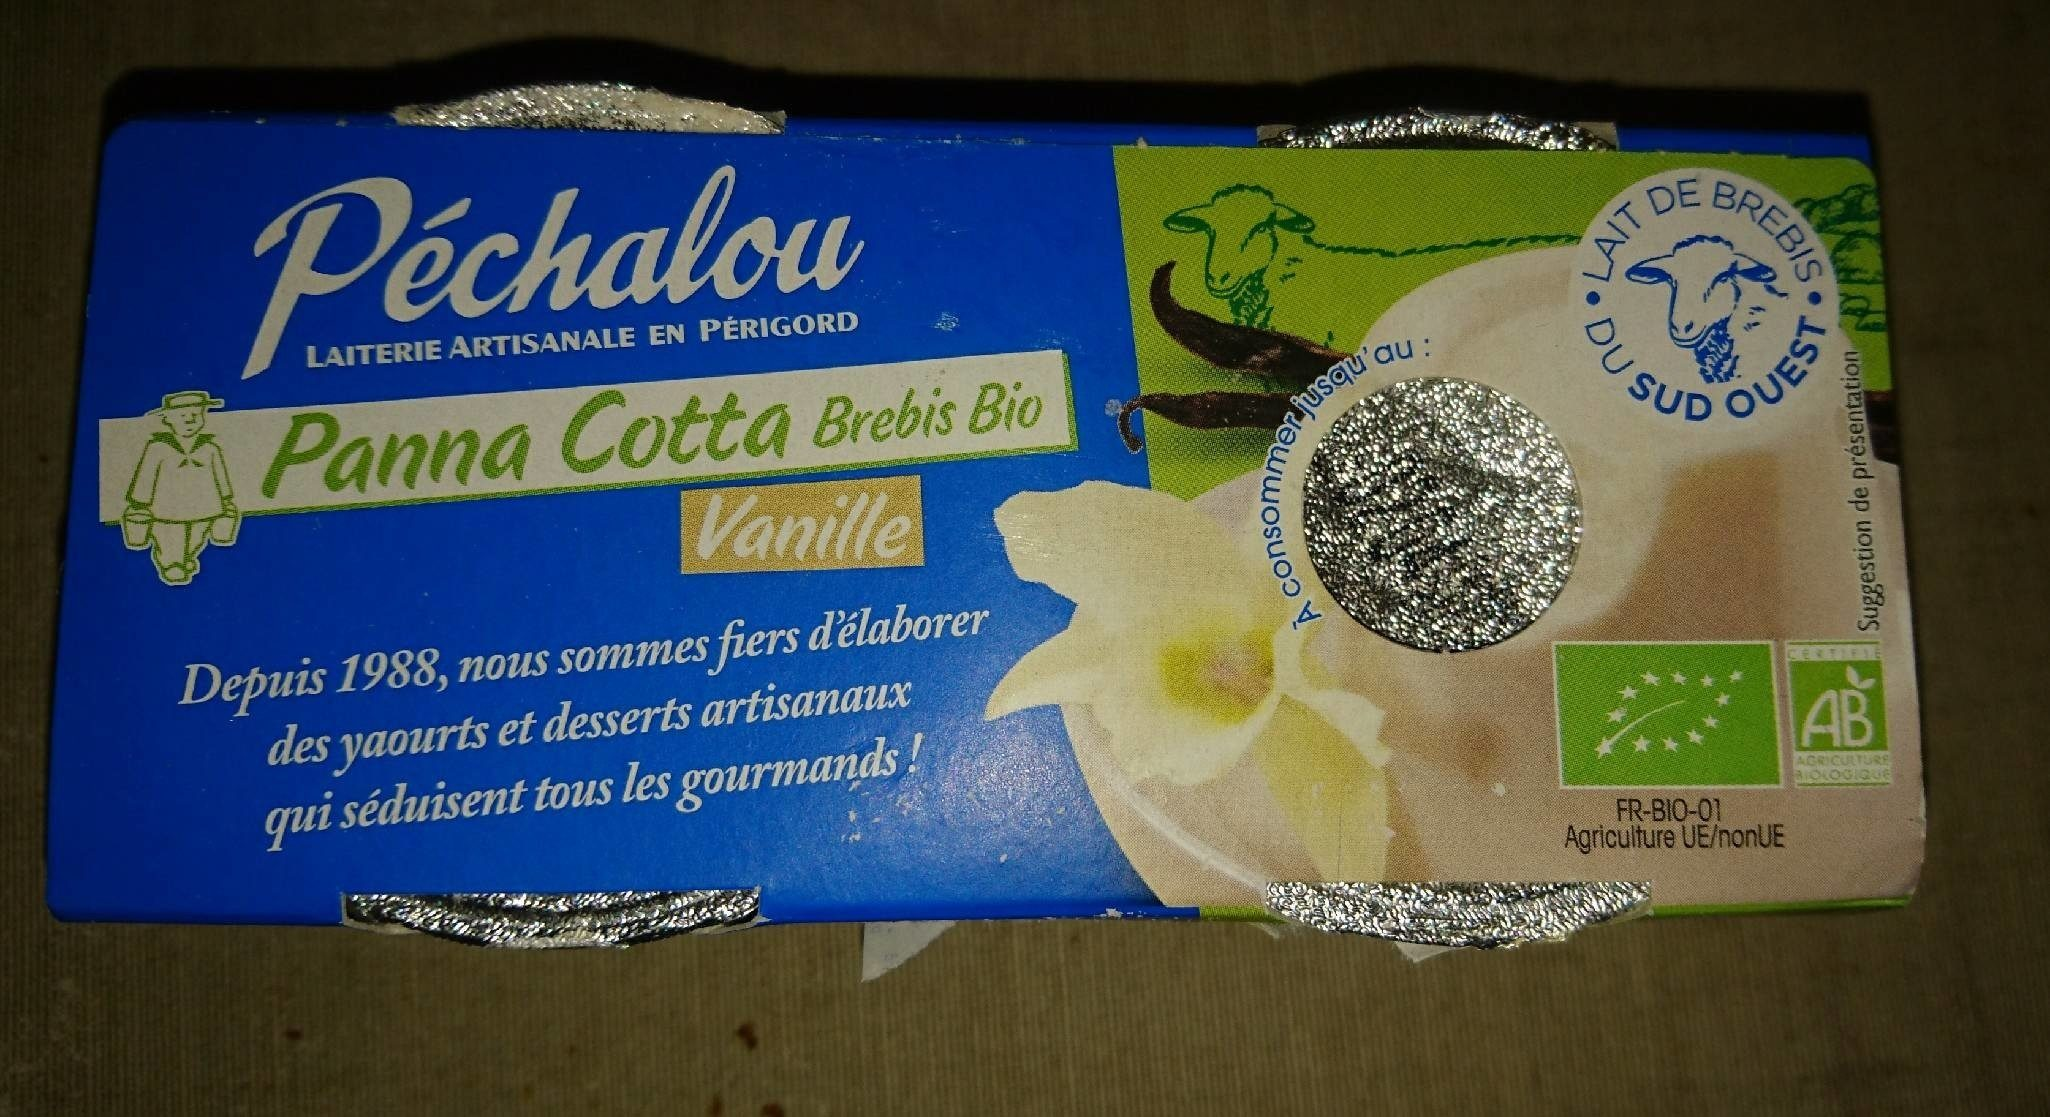 Panna cotta brebis bio - Product - fr